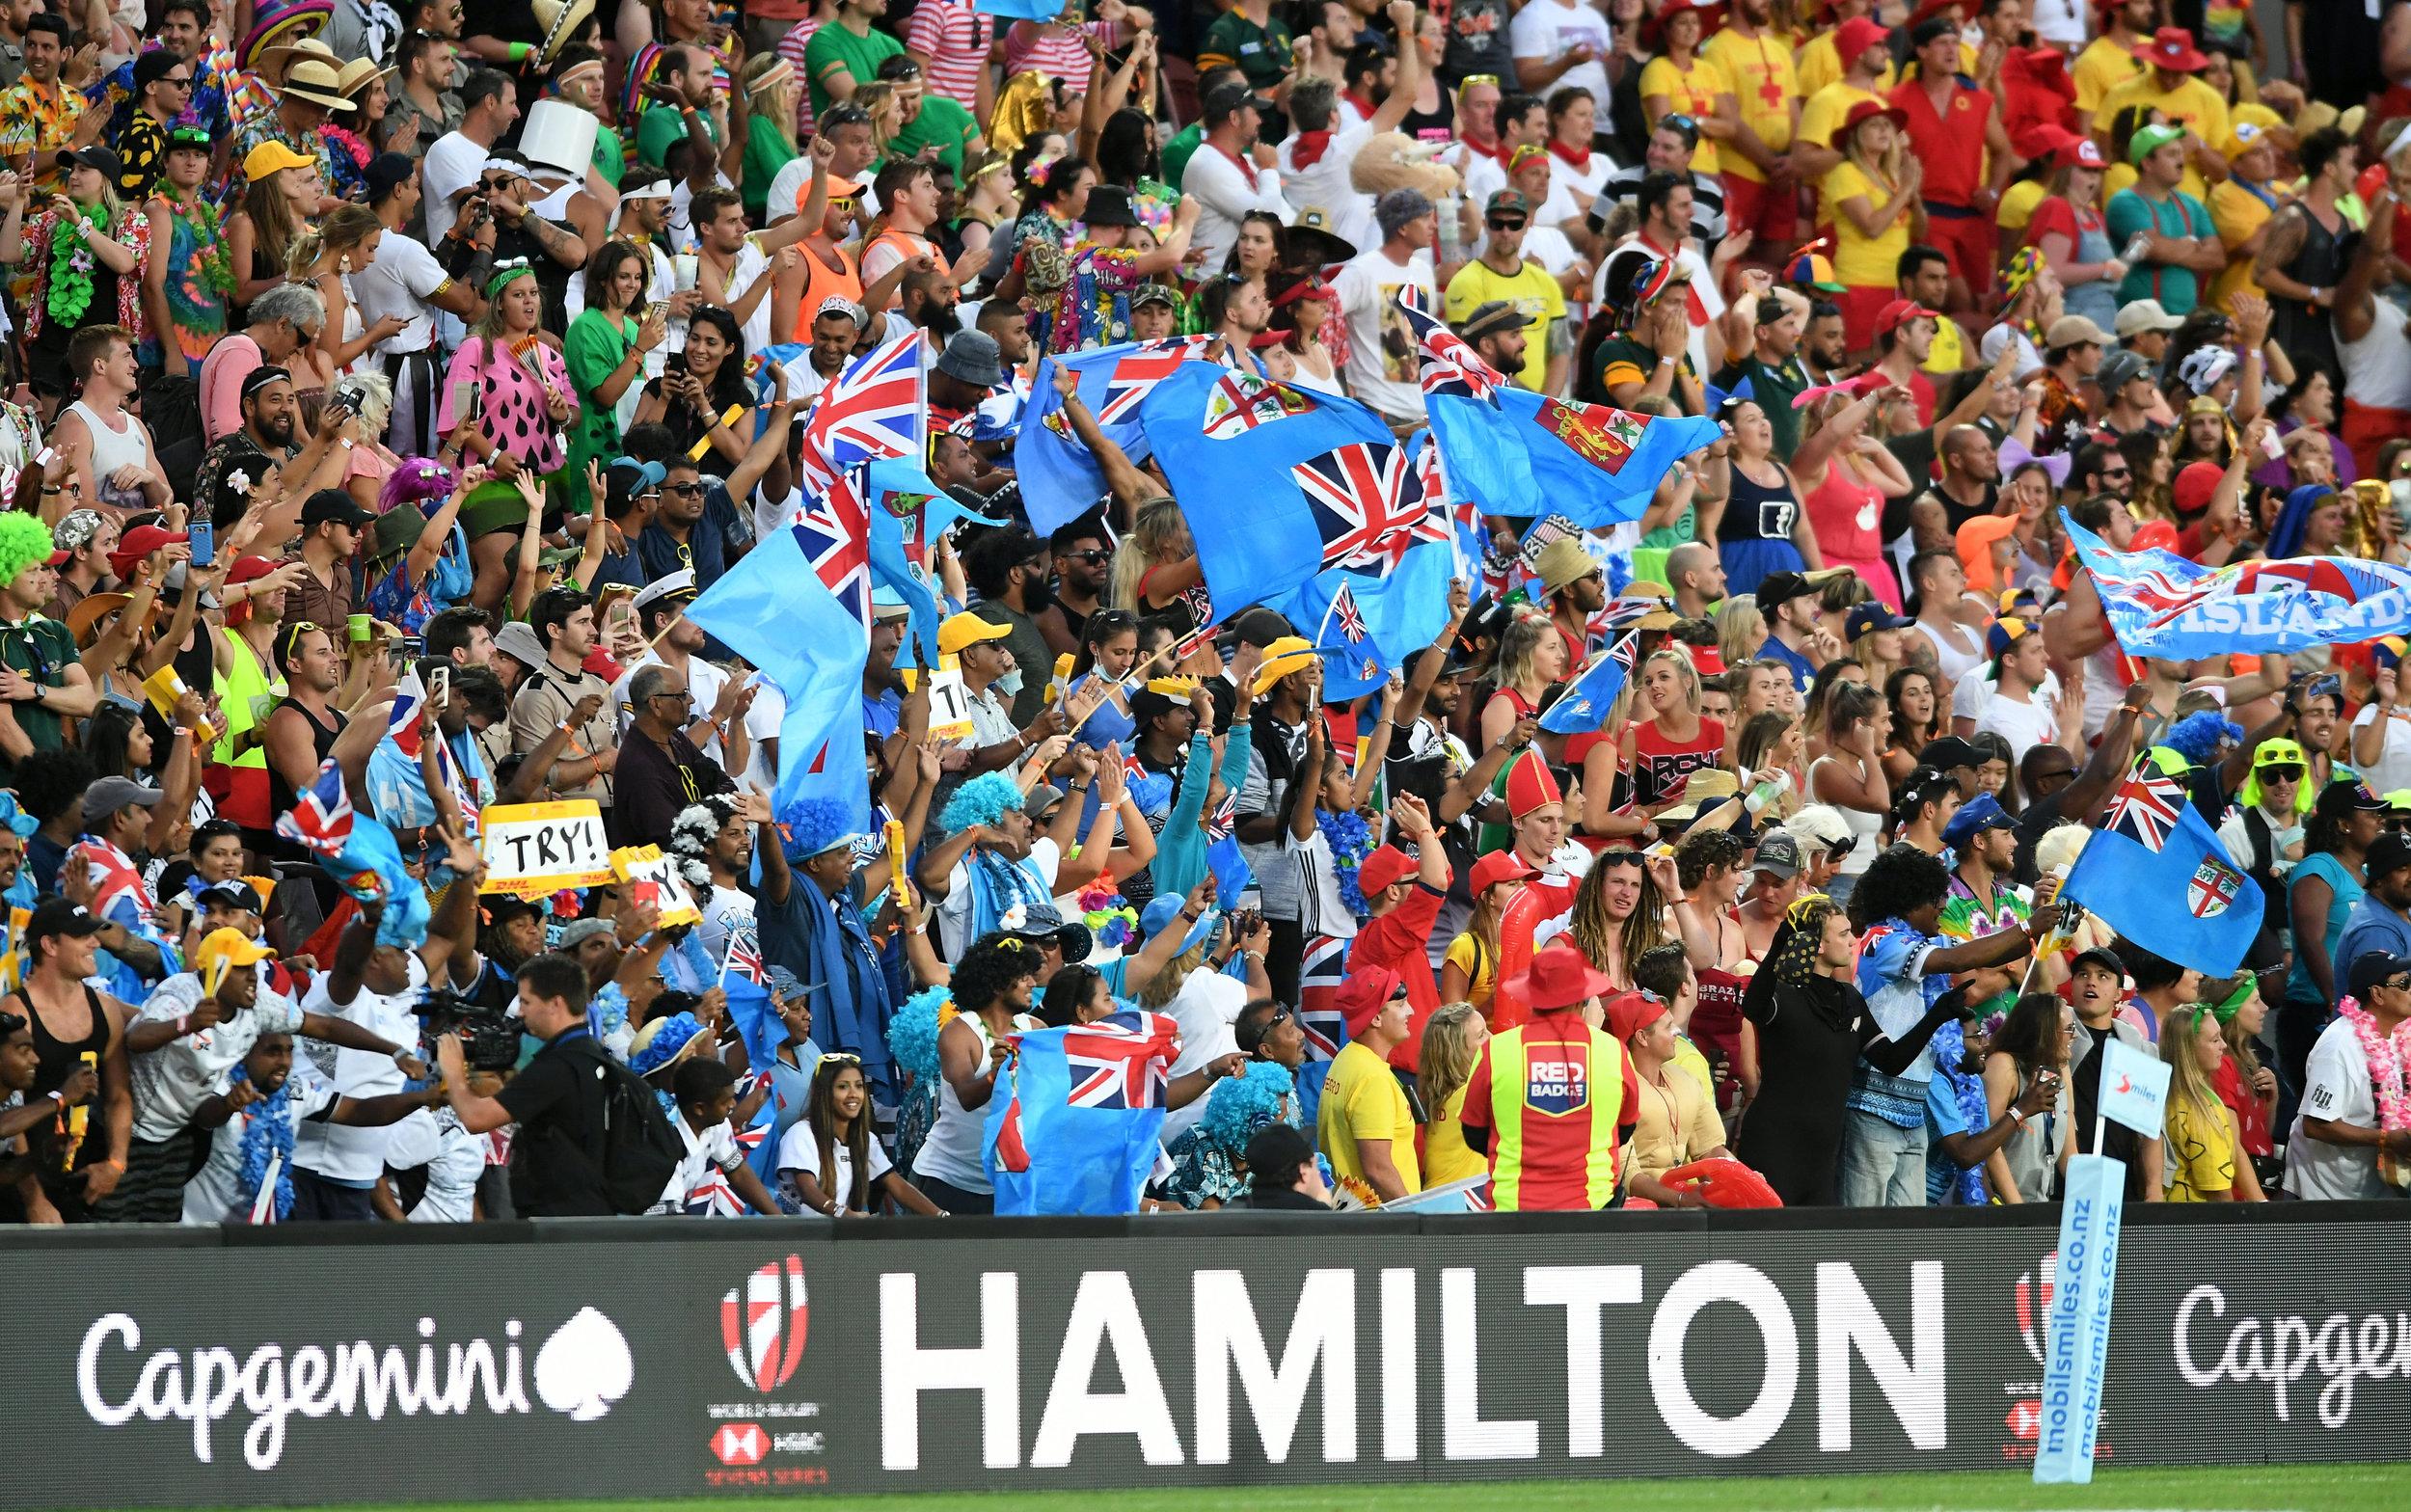 Fiji flags full crowd.jpg